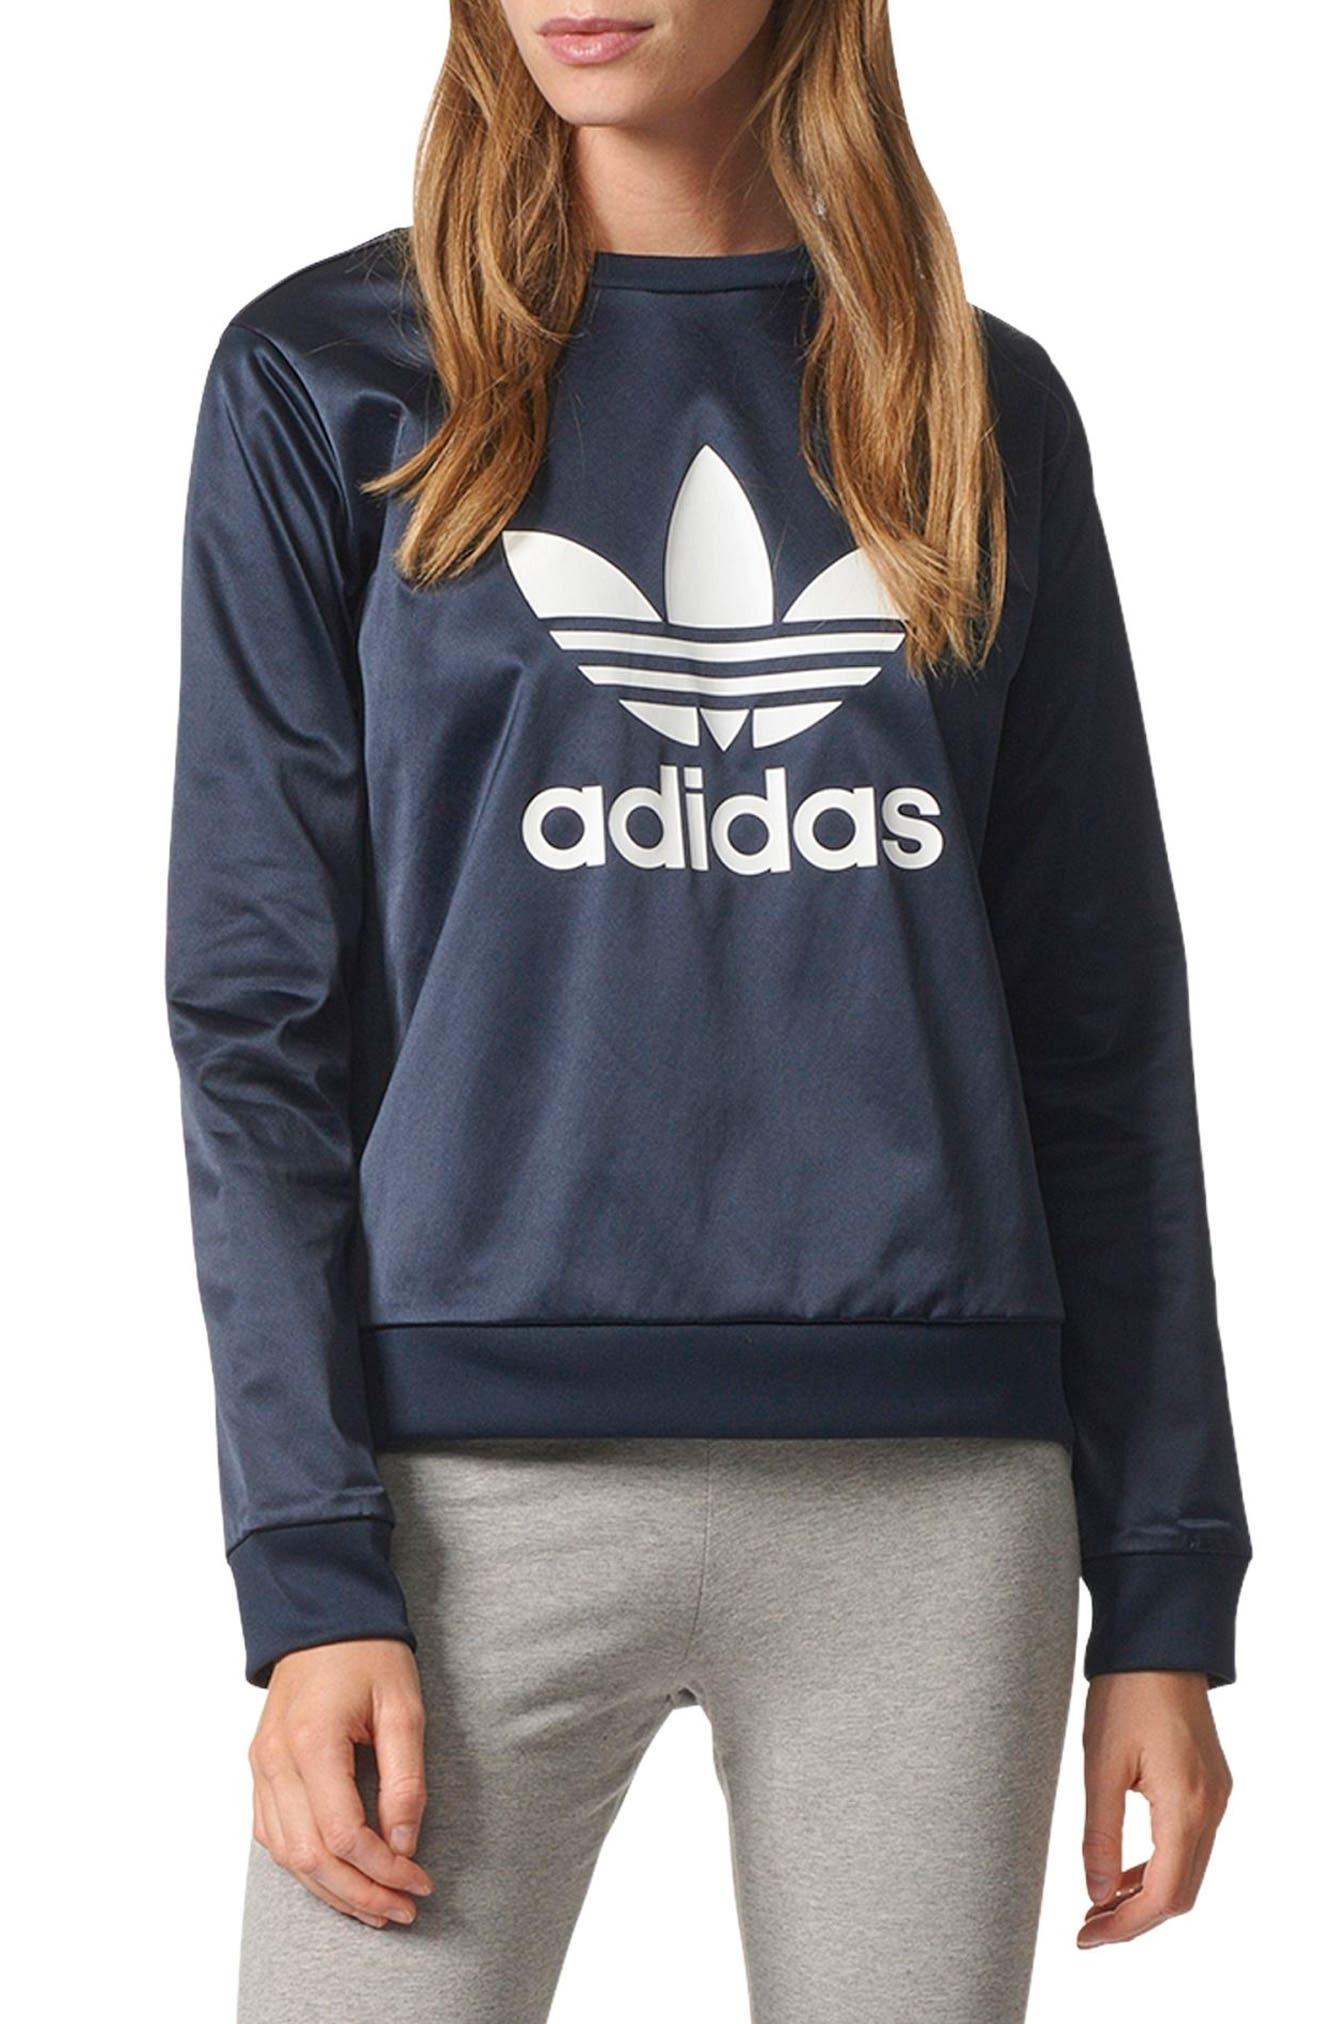 adidas Trefoil Crewneck Sweater